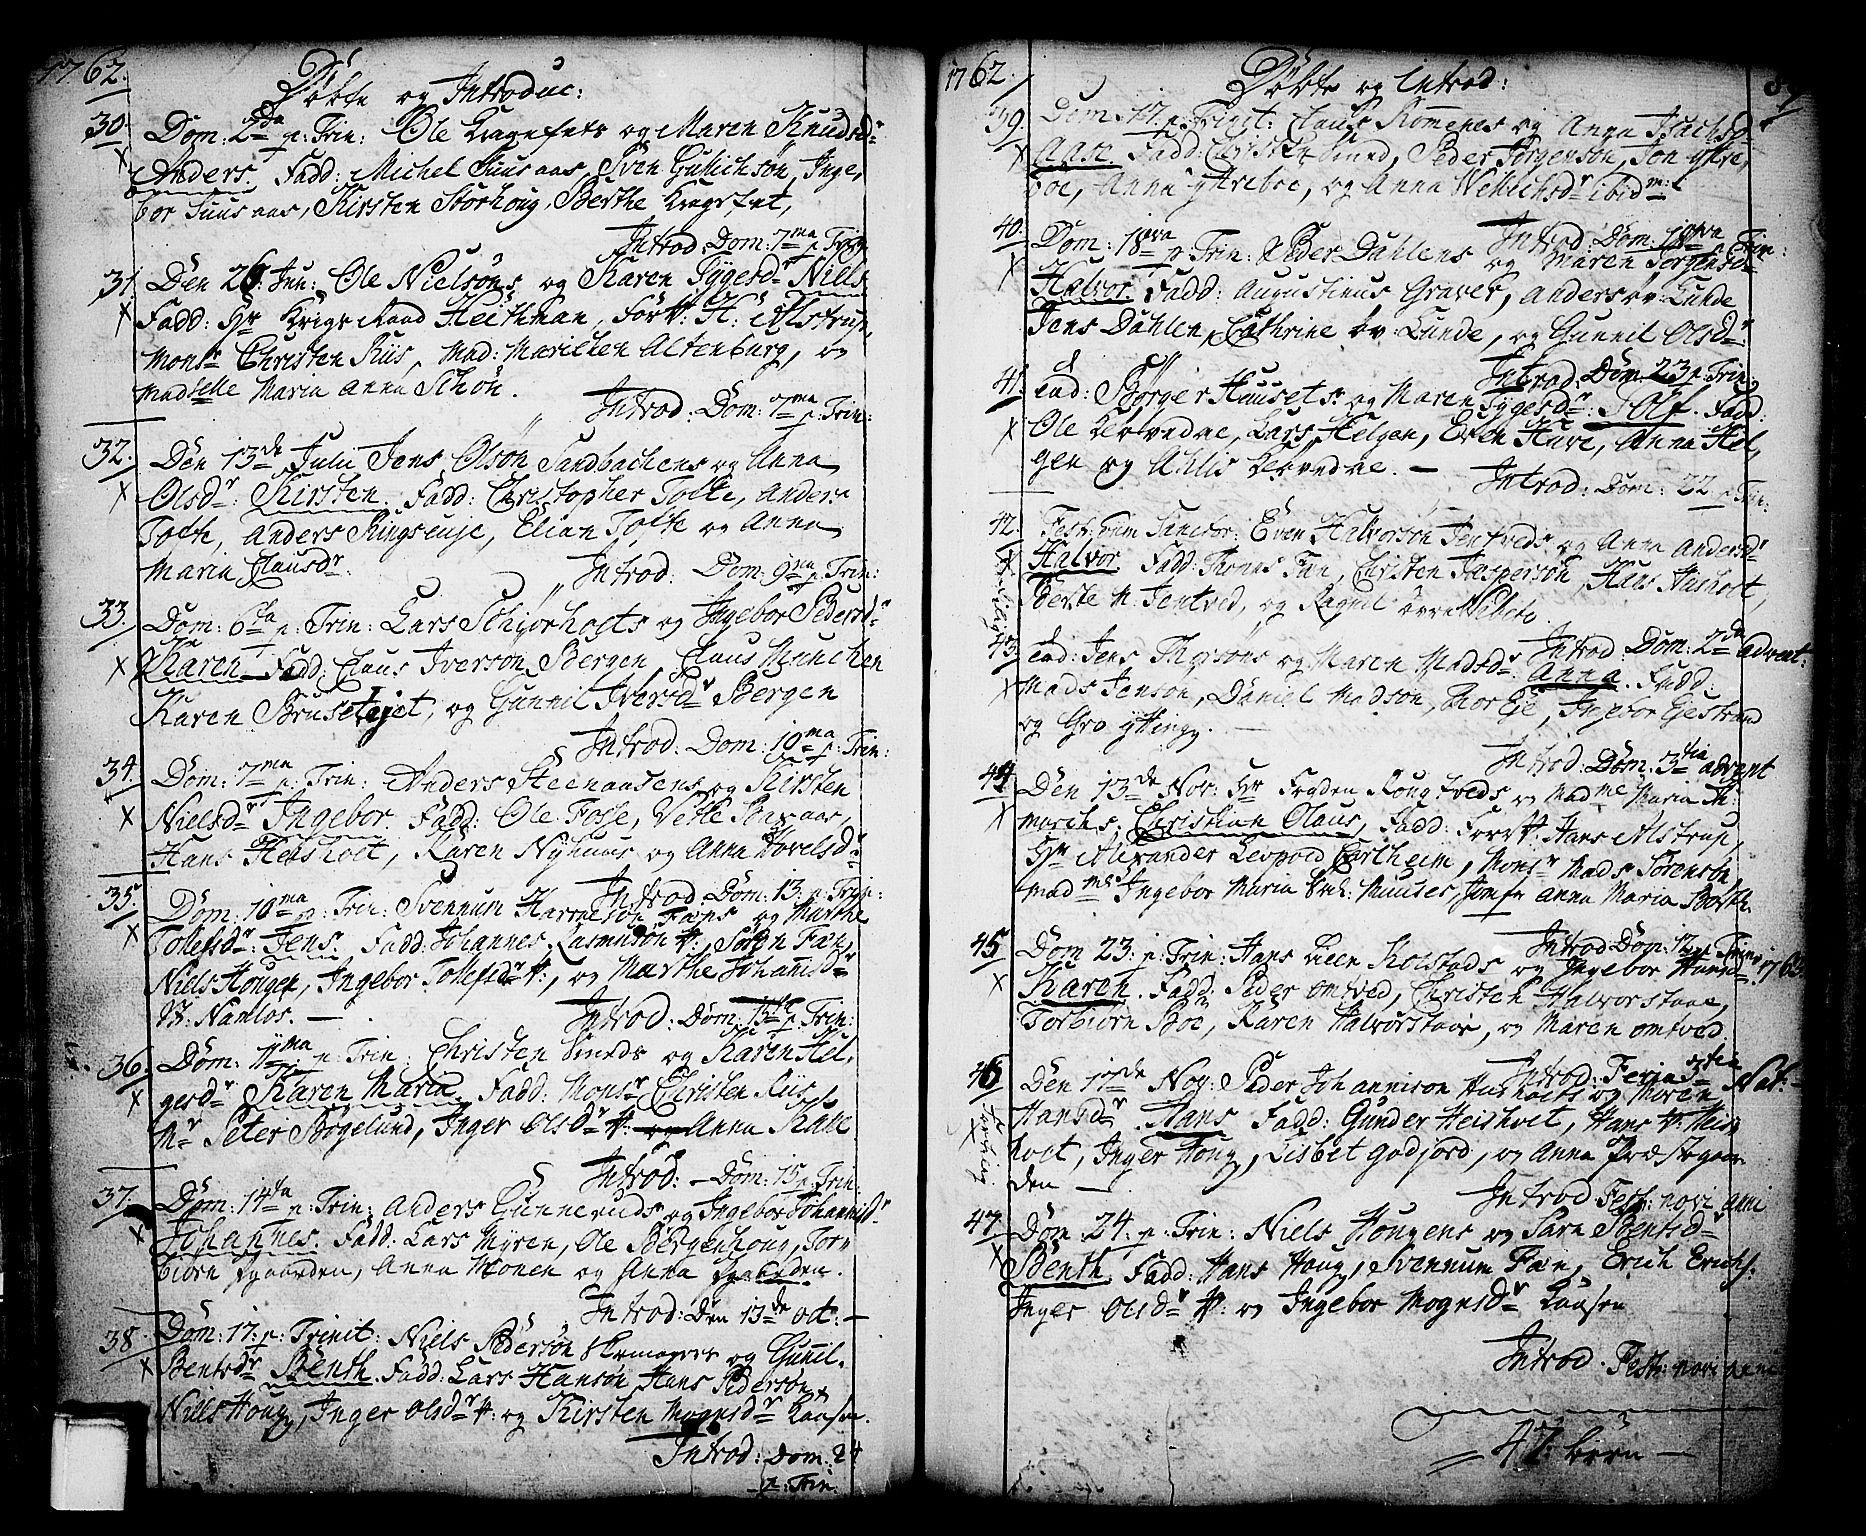 SAKO, Holla kirkebøker, F/Fa/L0001: Ministerialbok nr. 1, 1717-1779, s. 89